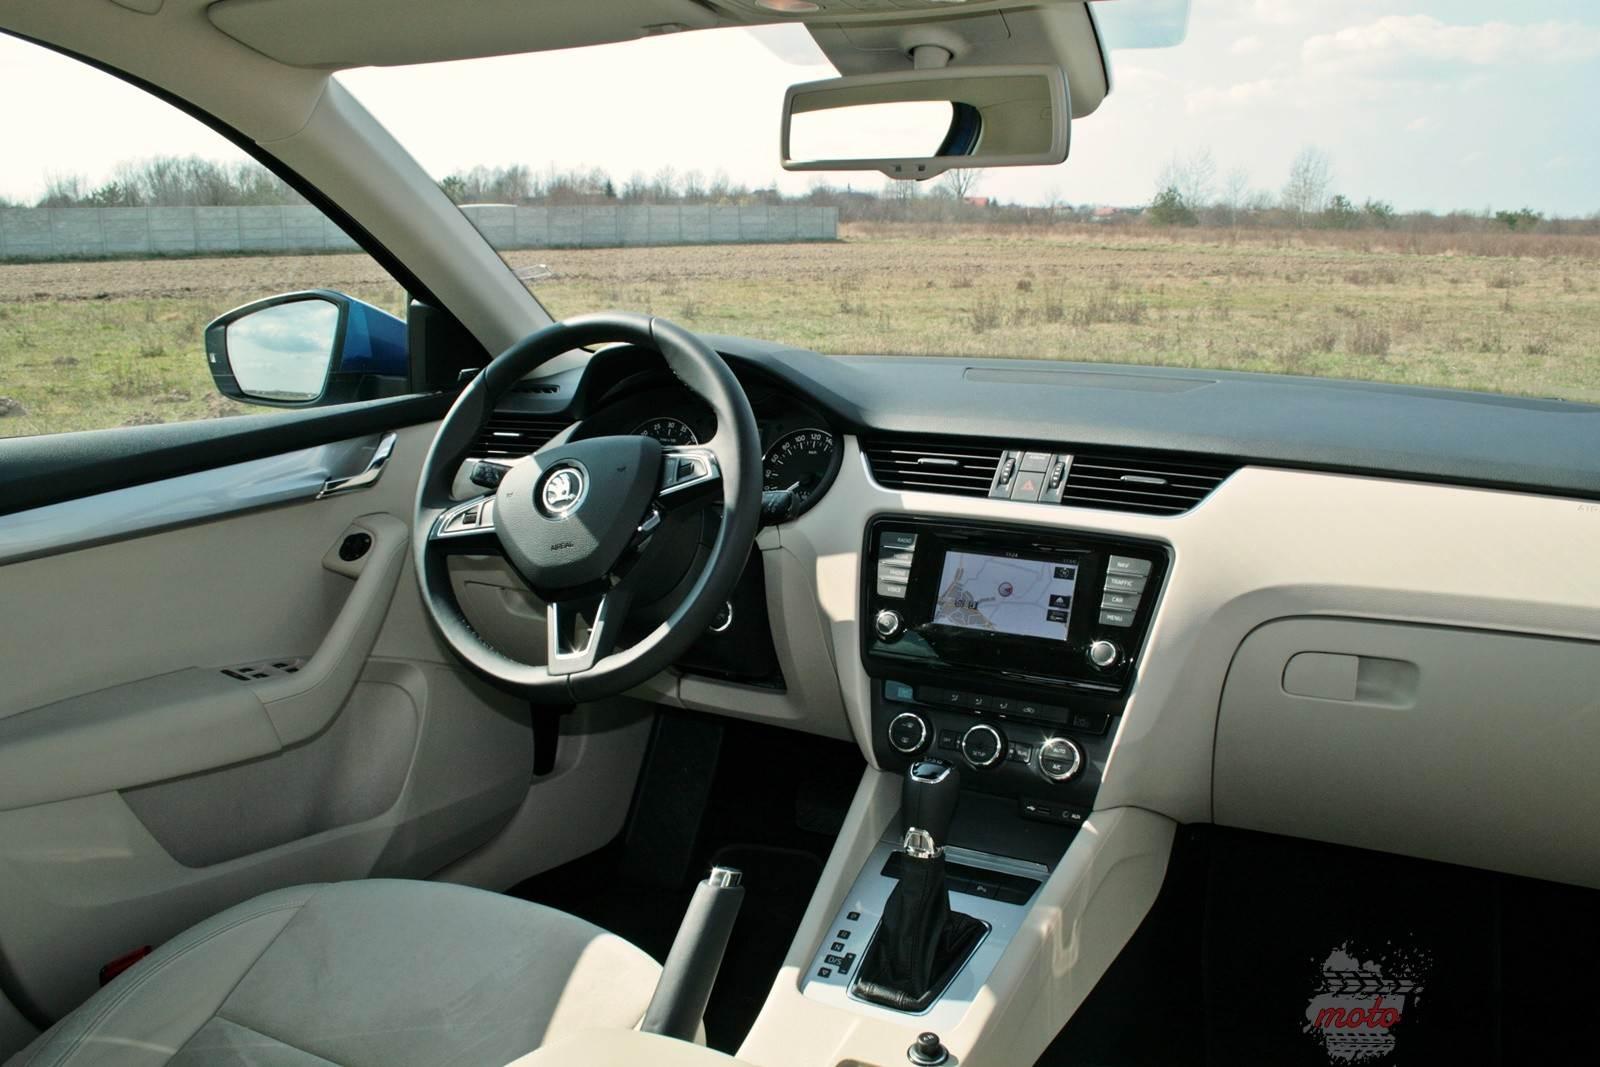 IMG 0232 Test: Škoda Octavia 2.0 TDI DSG Elegance